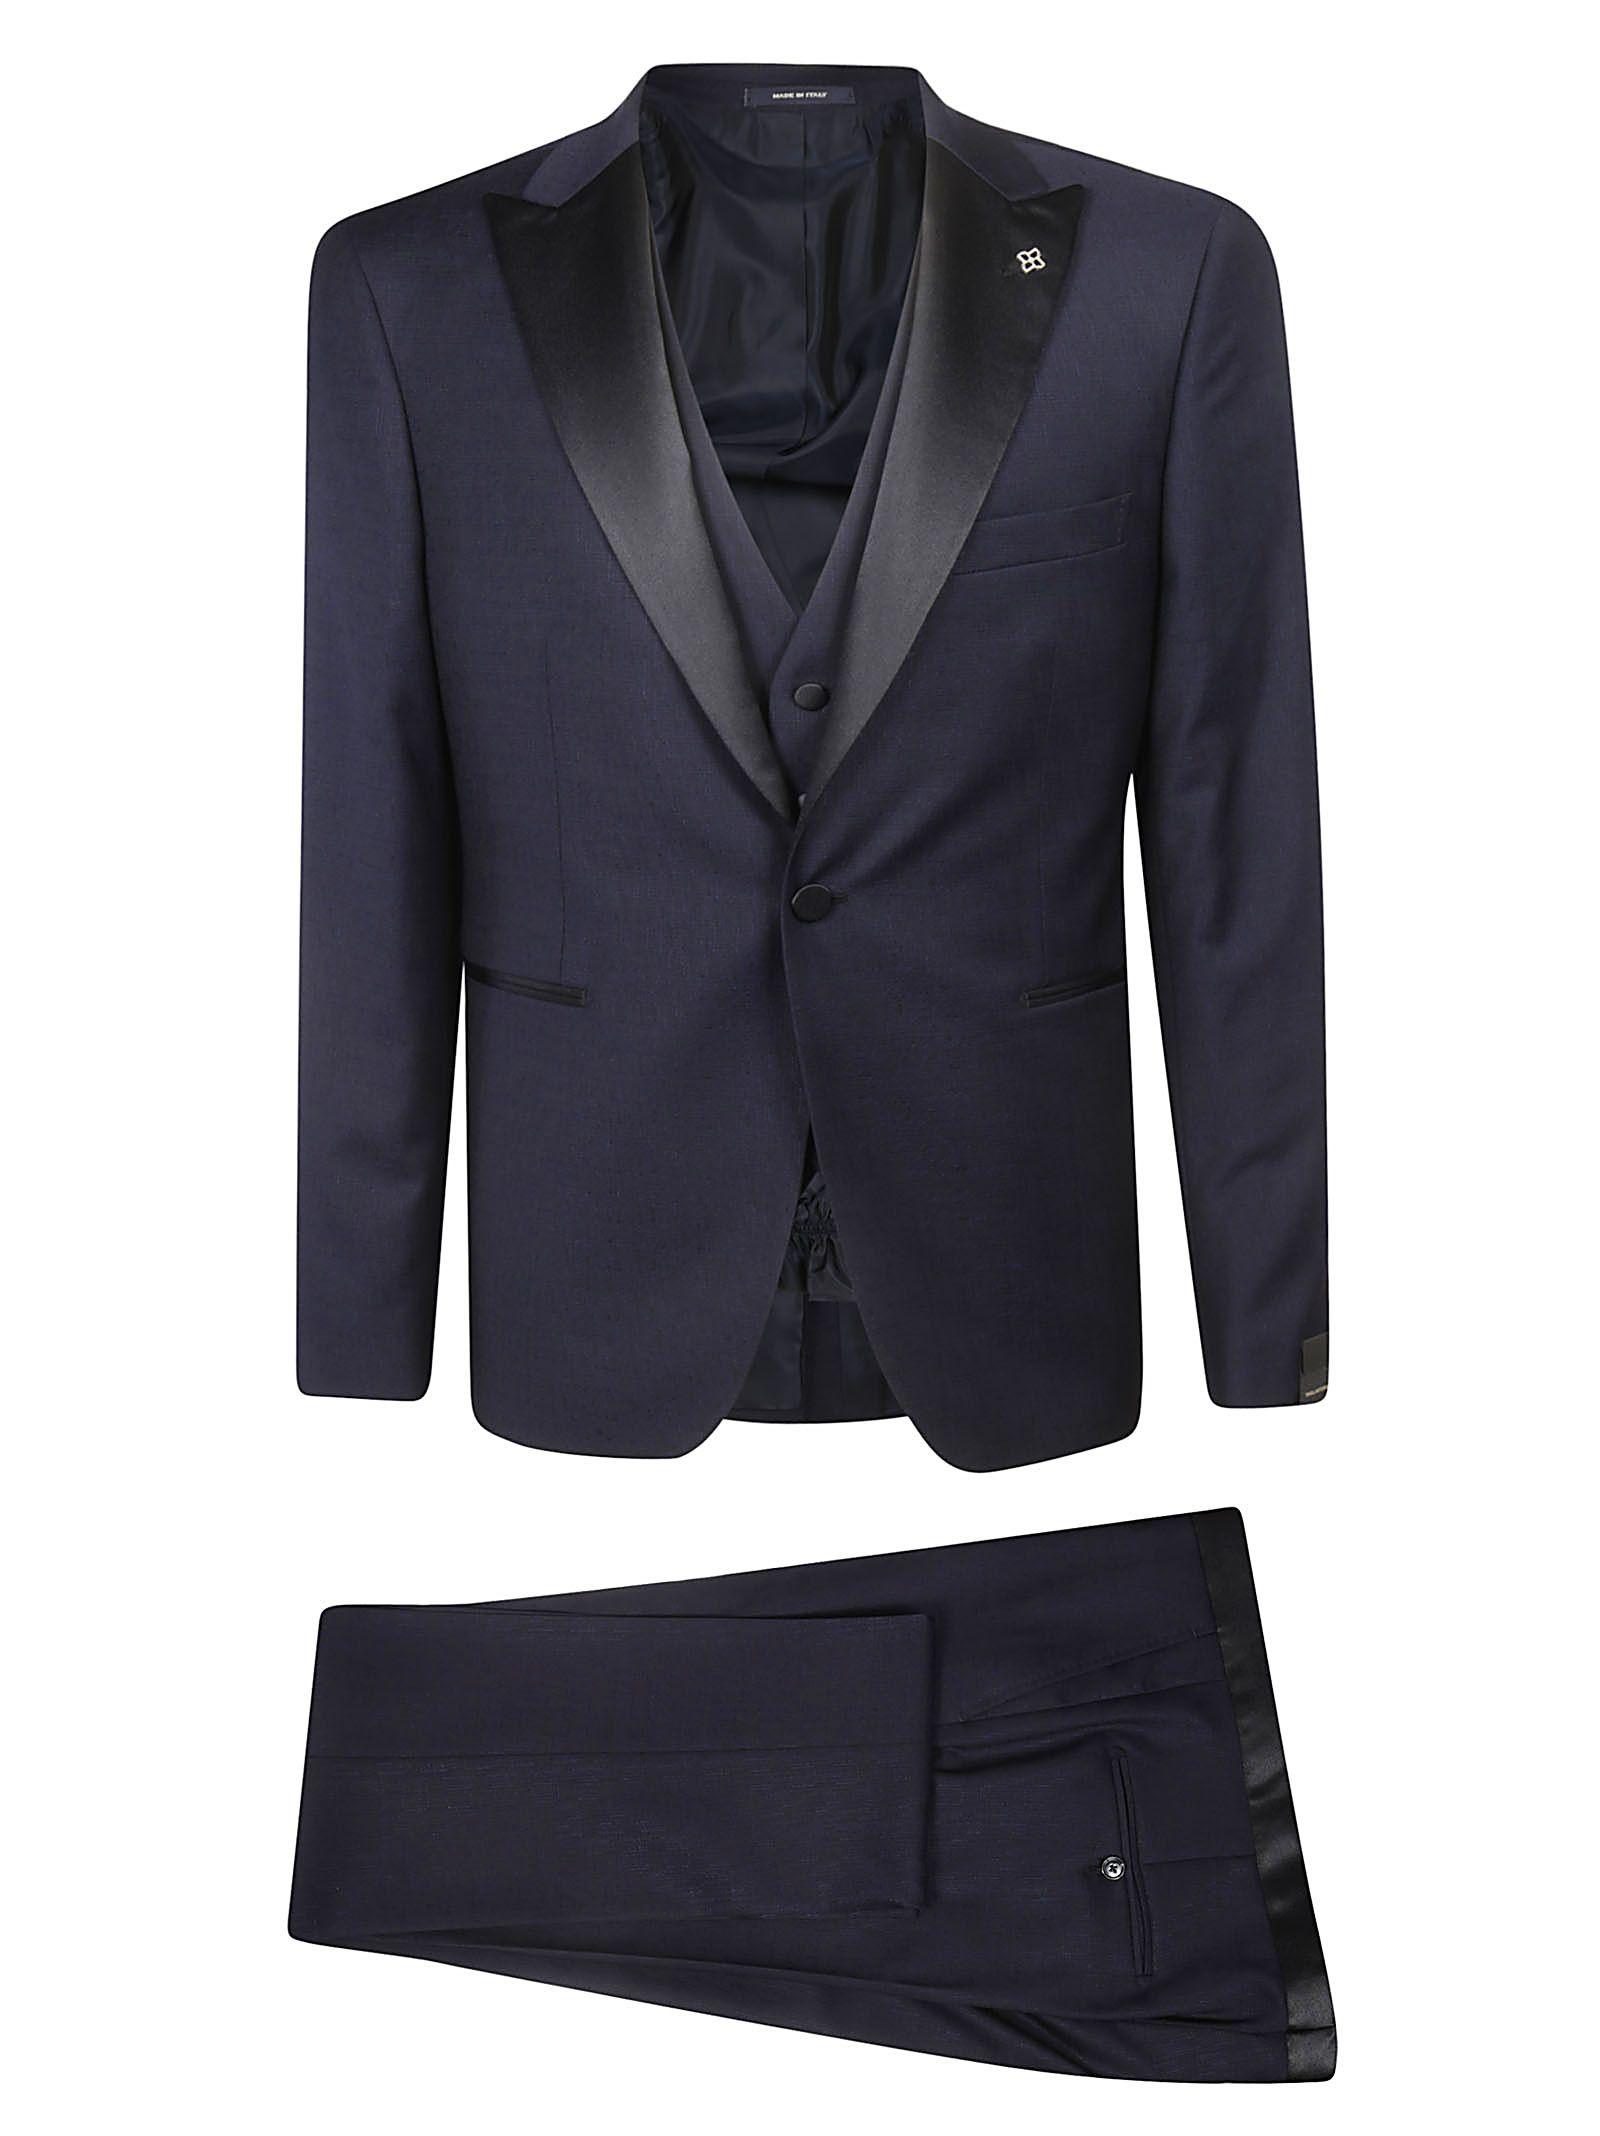 Tagliatore 0205 Formal Double Layer Suit